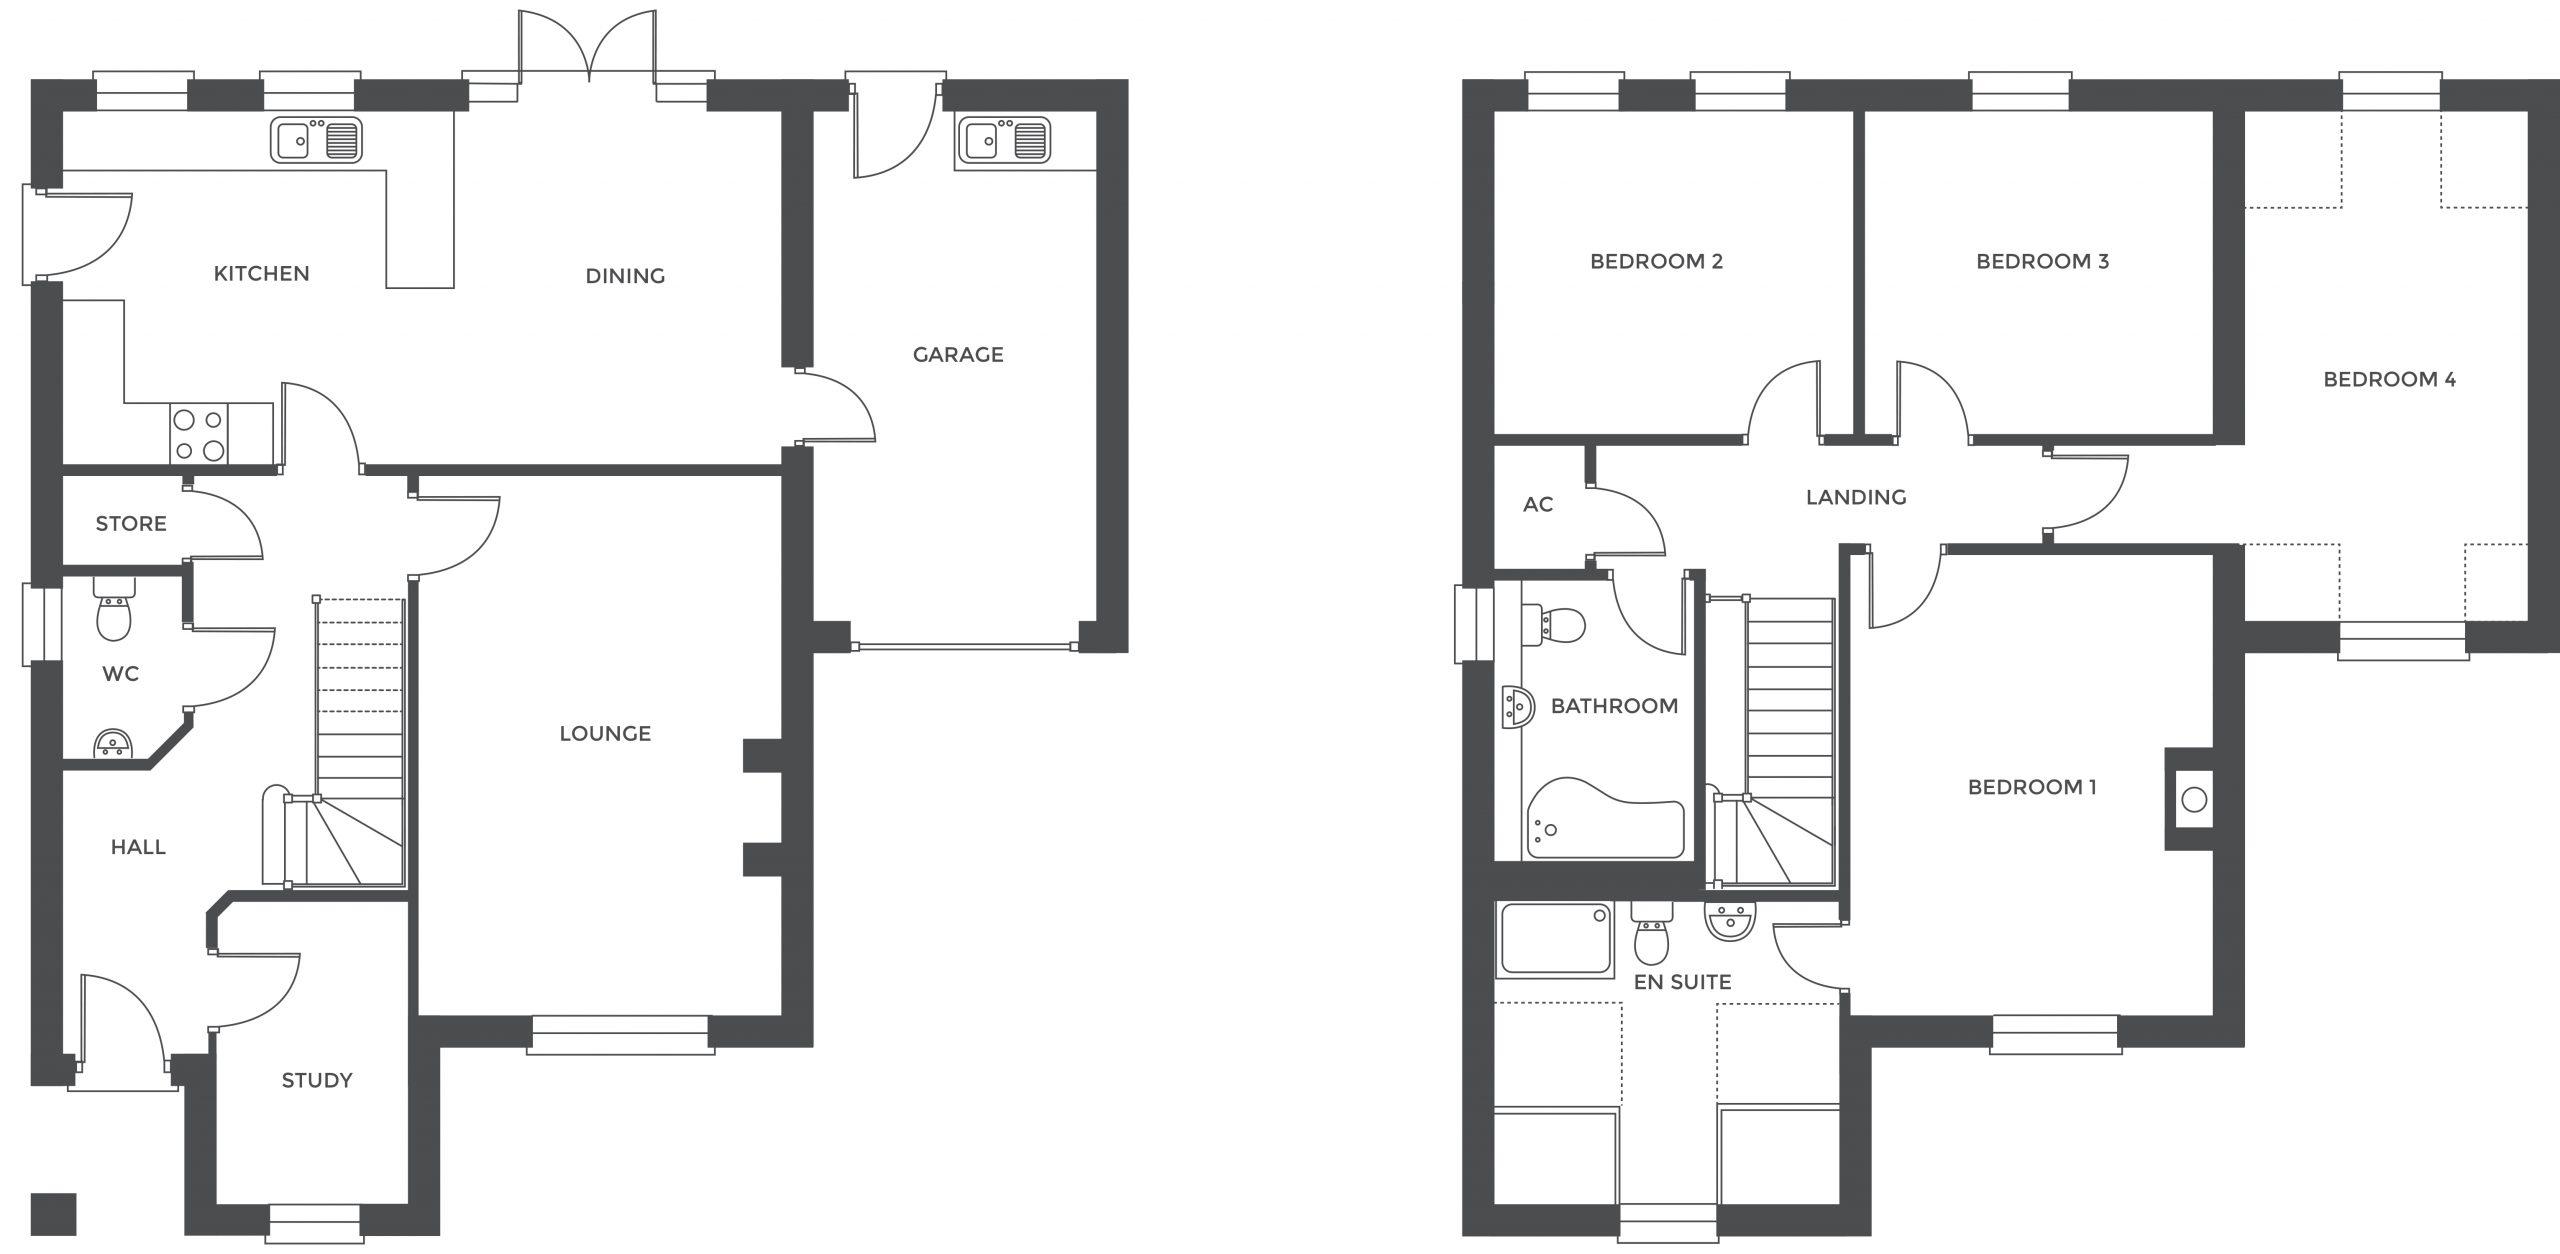 Acresford Park, Plot 56 floor plan